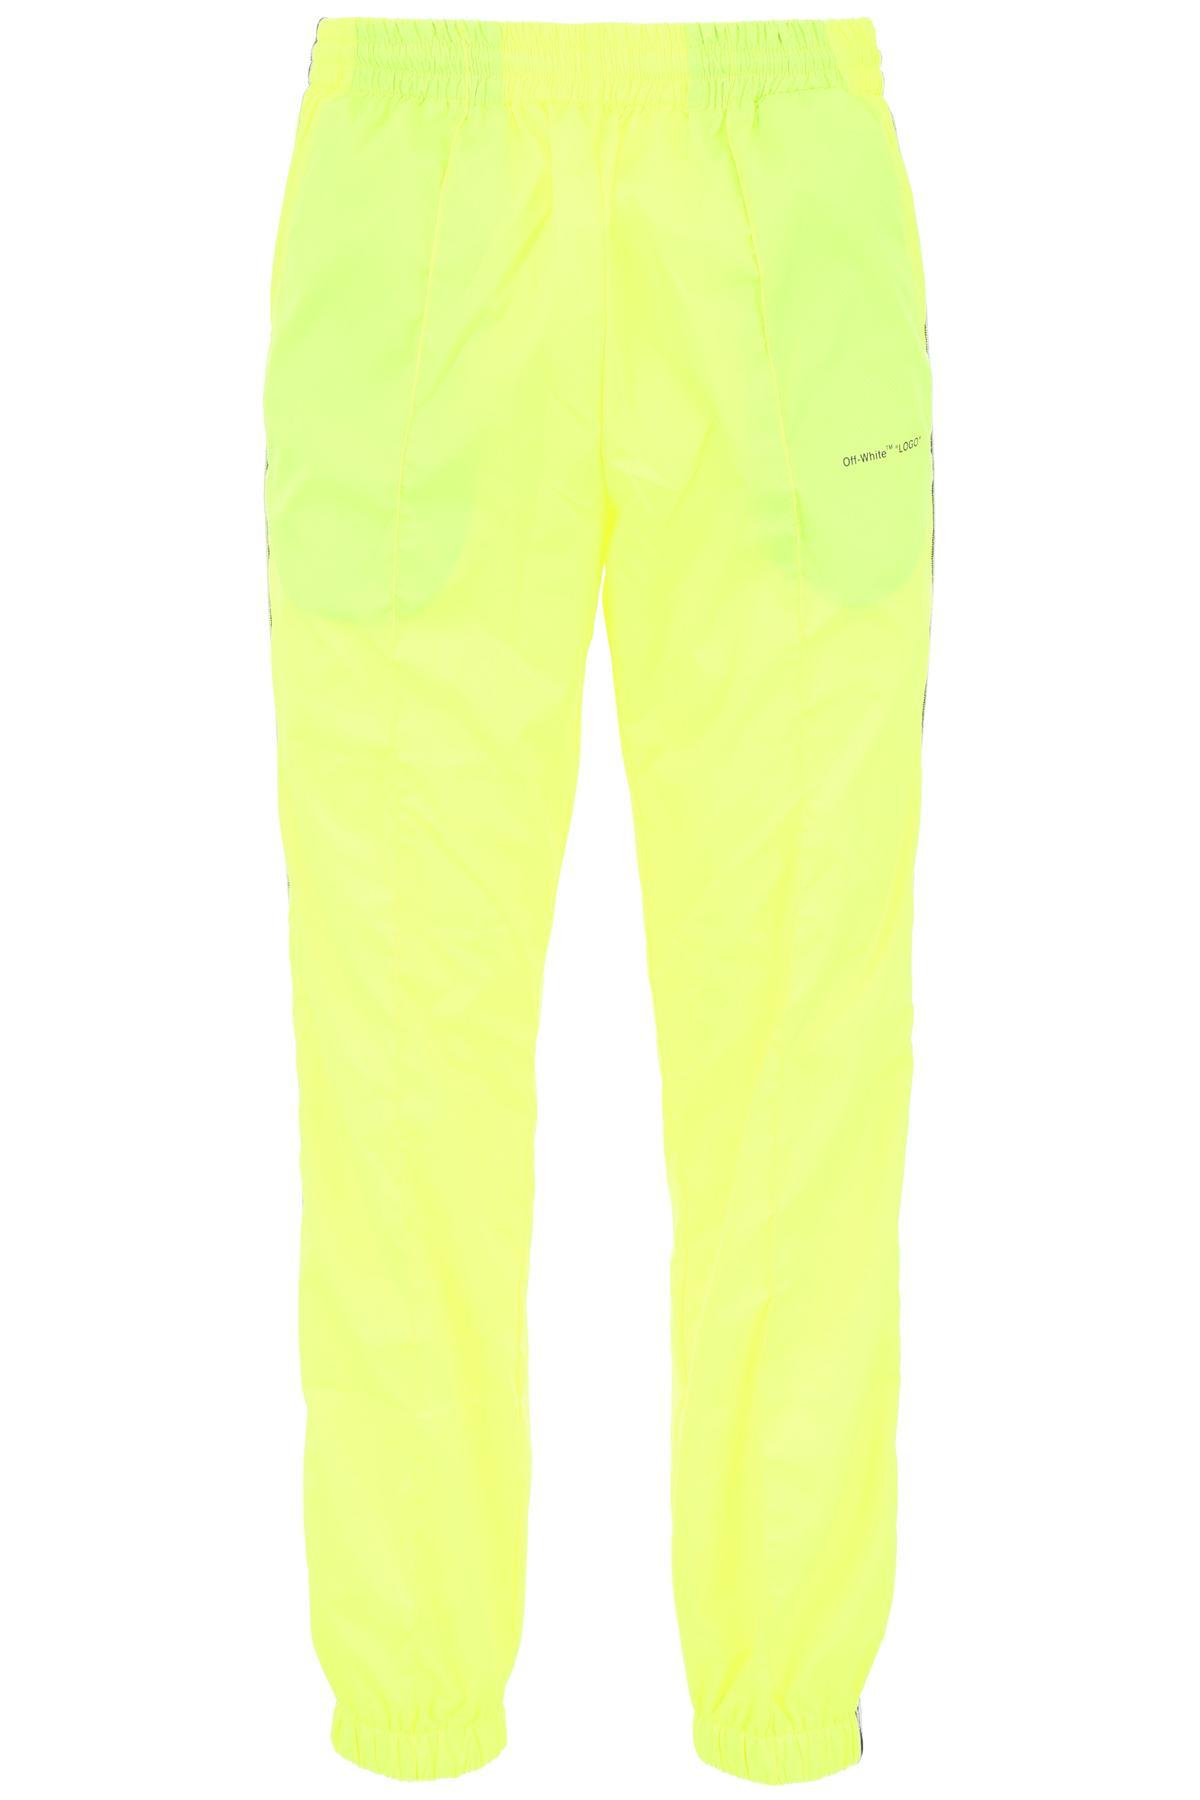 Men's Yellow Fluorescent Trackpants